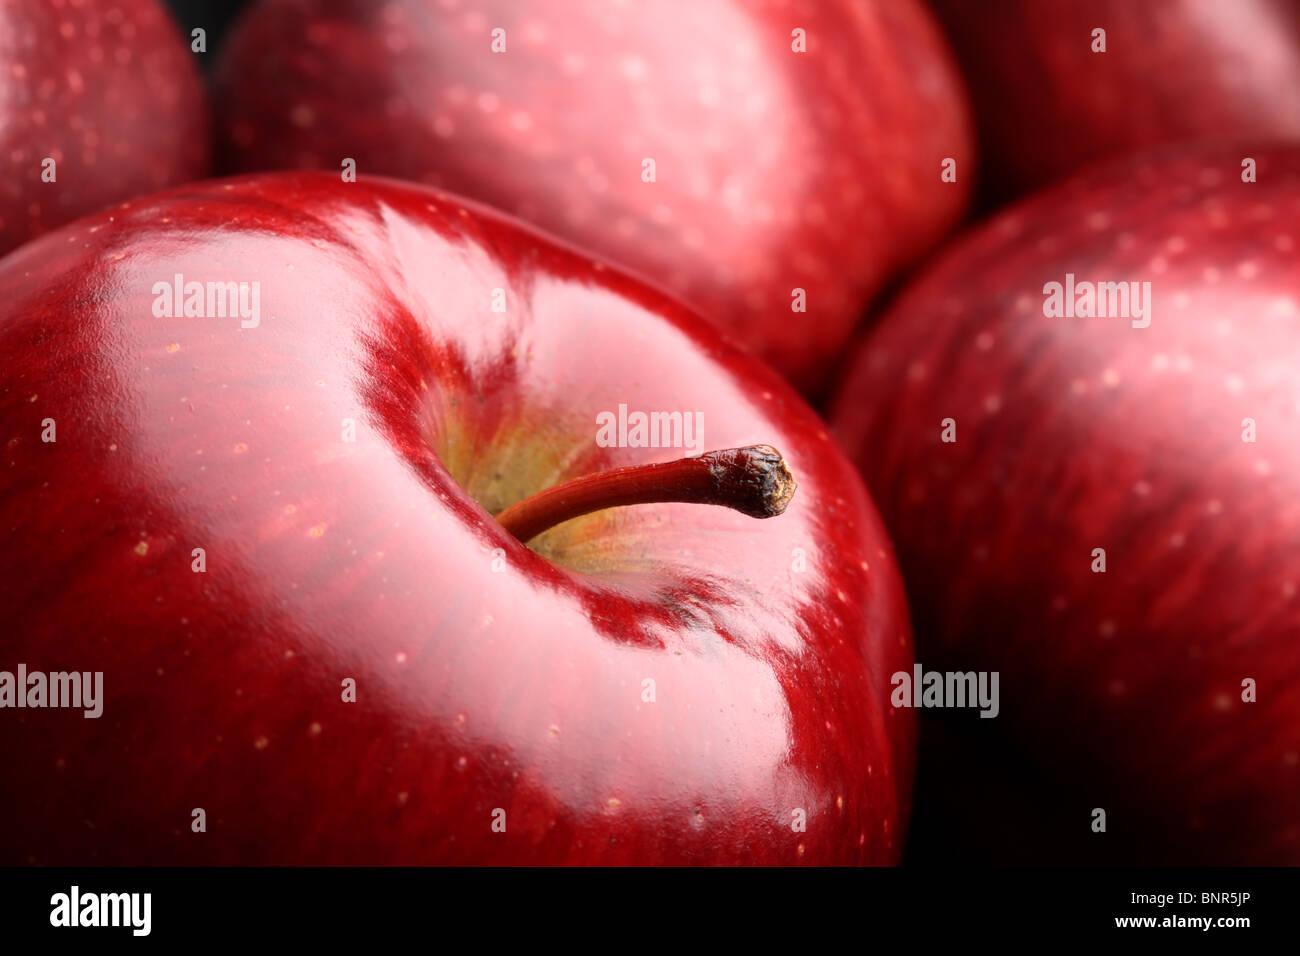 Close-up of fresh dark red apples Stock Photo